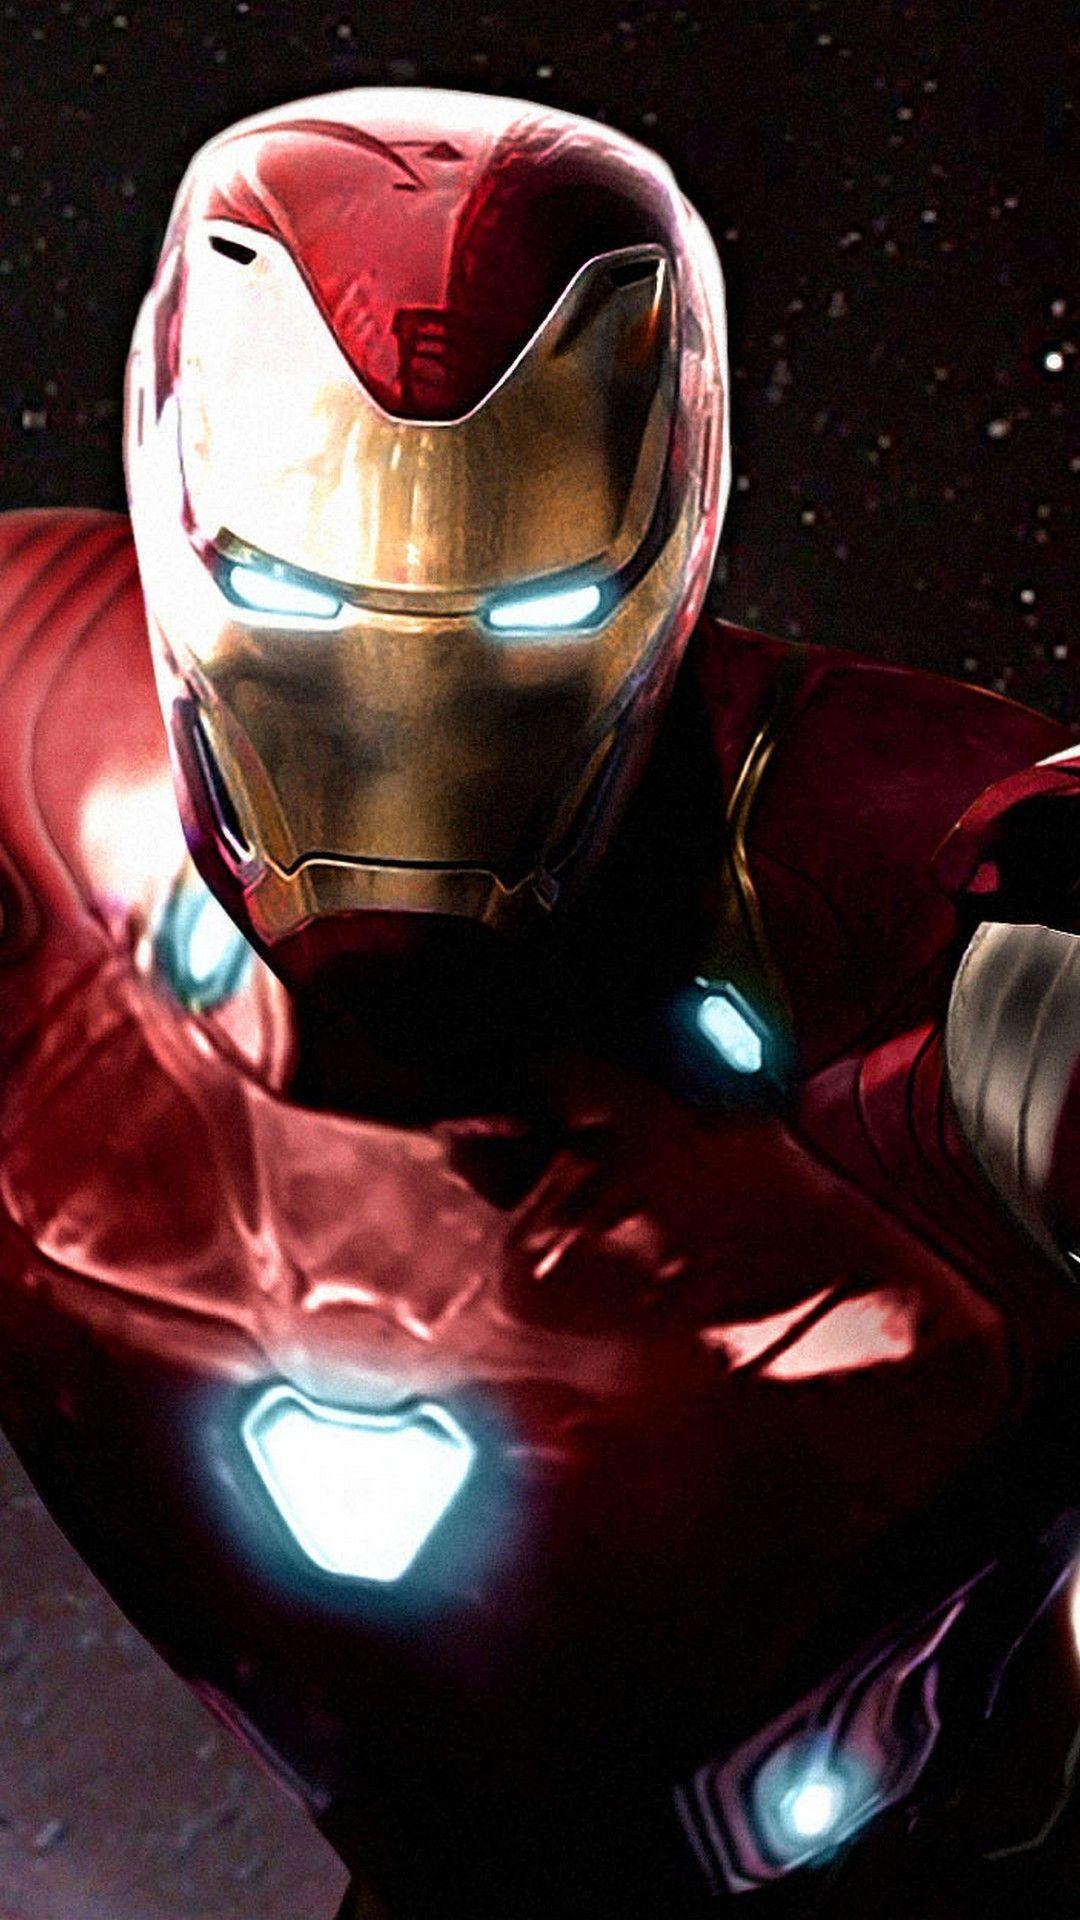 Iron Man Avengers Infinity War iPhone Wallpaper – 2018 iPhone …